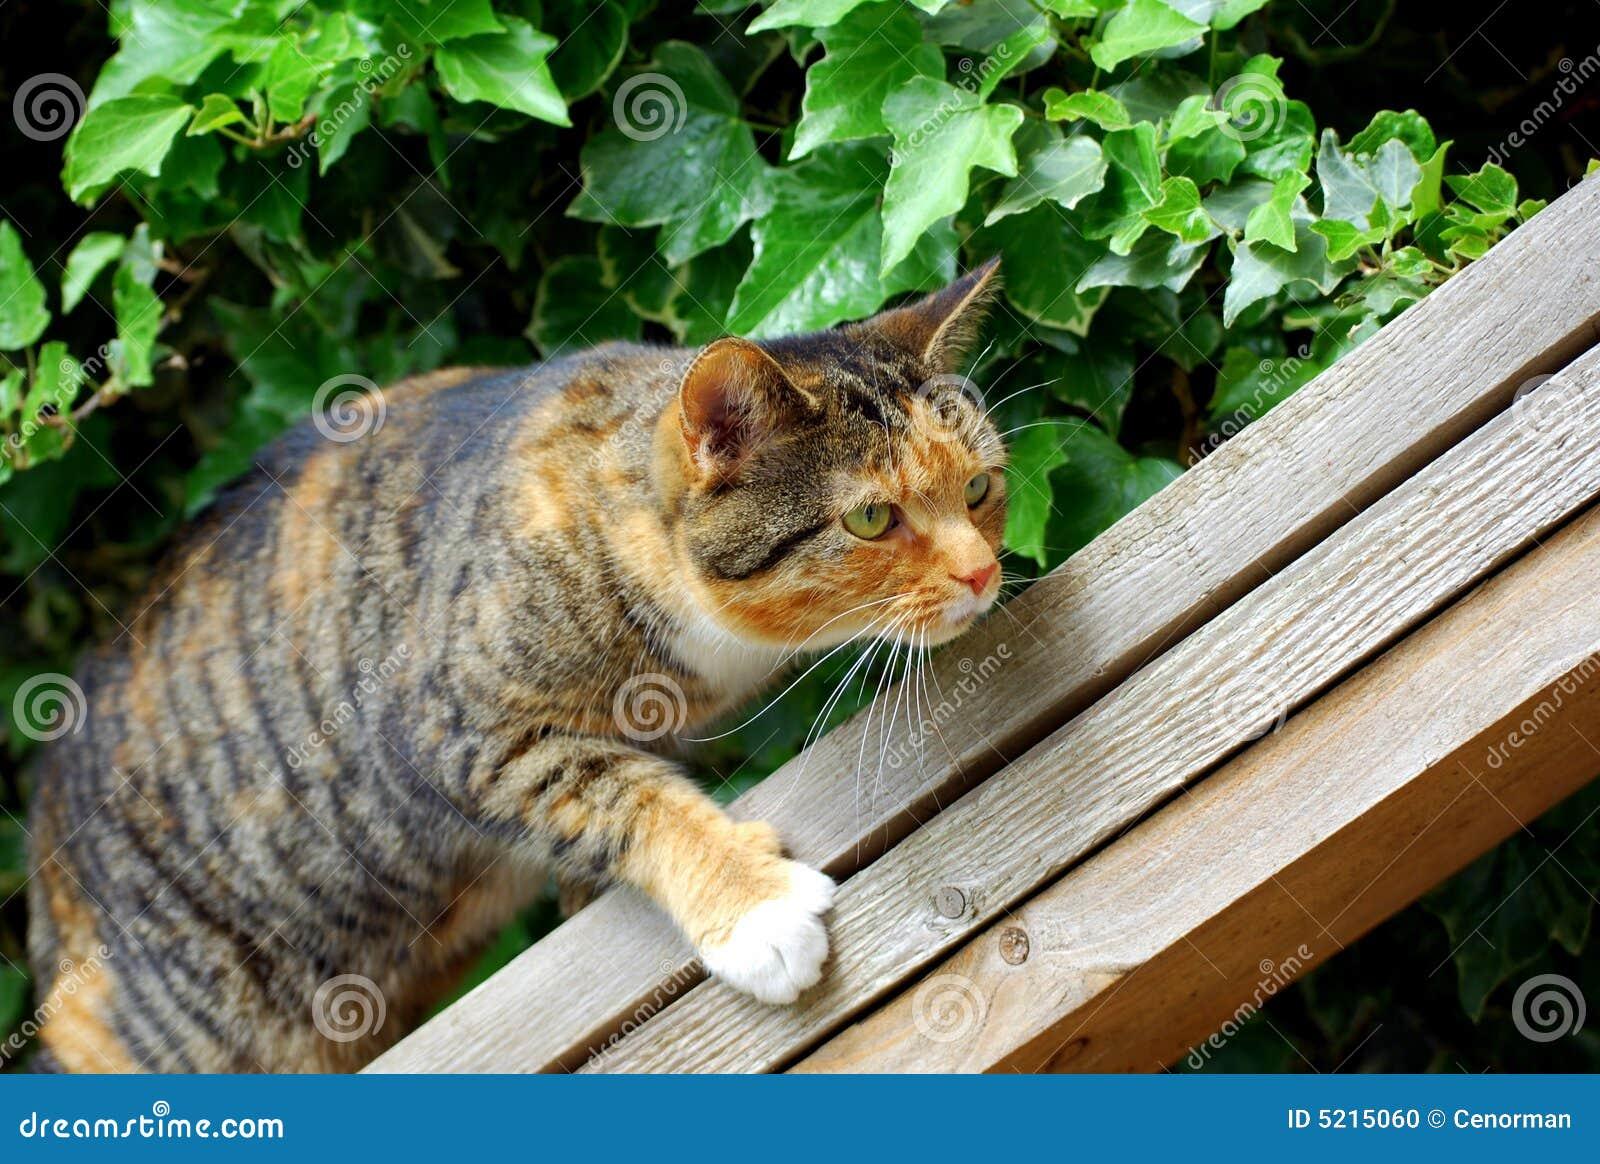 Cat climbing some wood